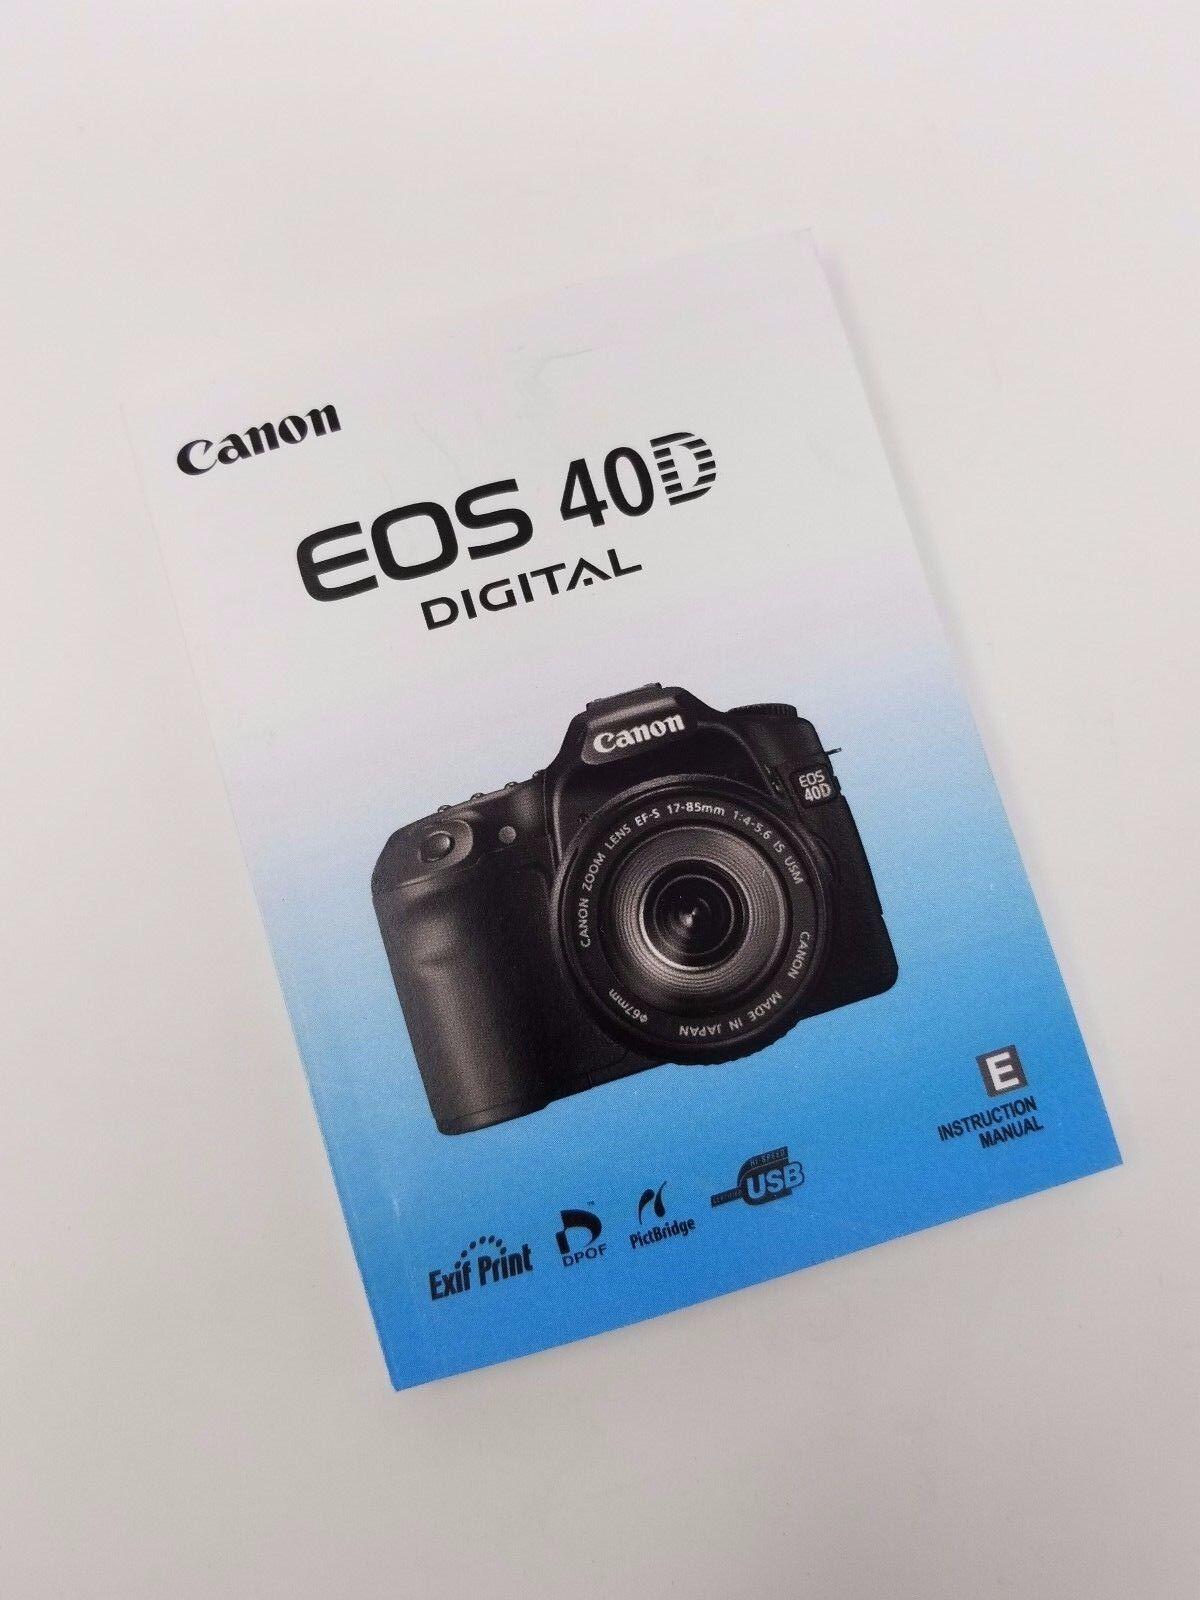 canon eos 40d genuine instruction owners manual book original new rh bayshop com Canon EOS 40D SLR Digital Canon EOS 40D Photography